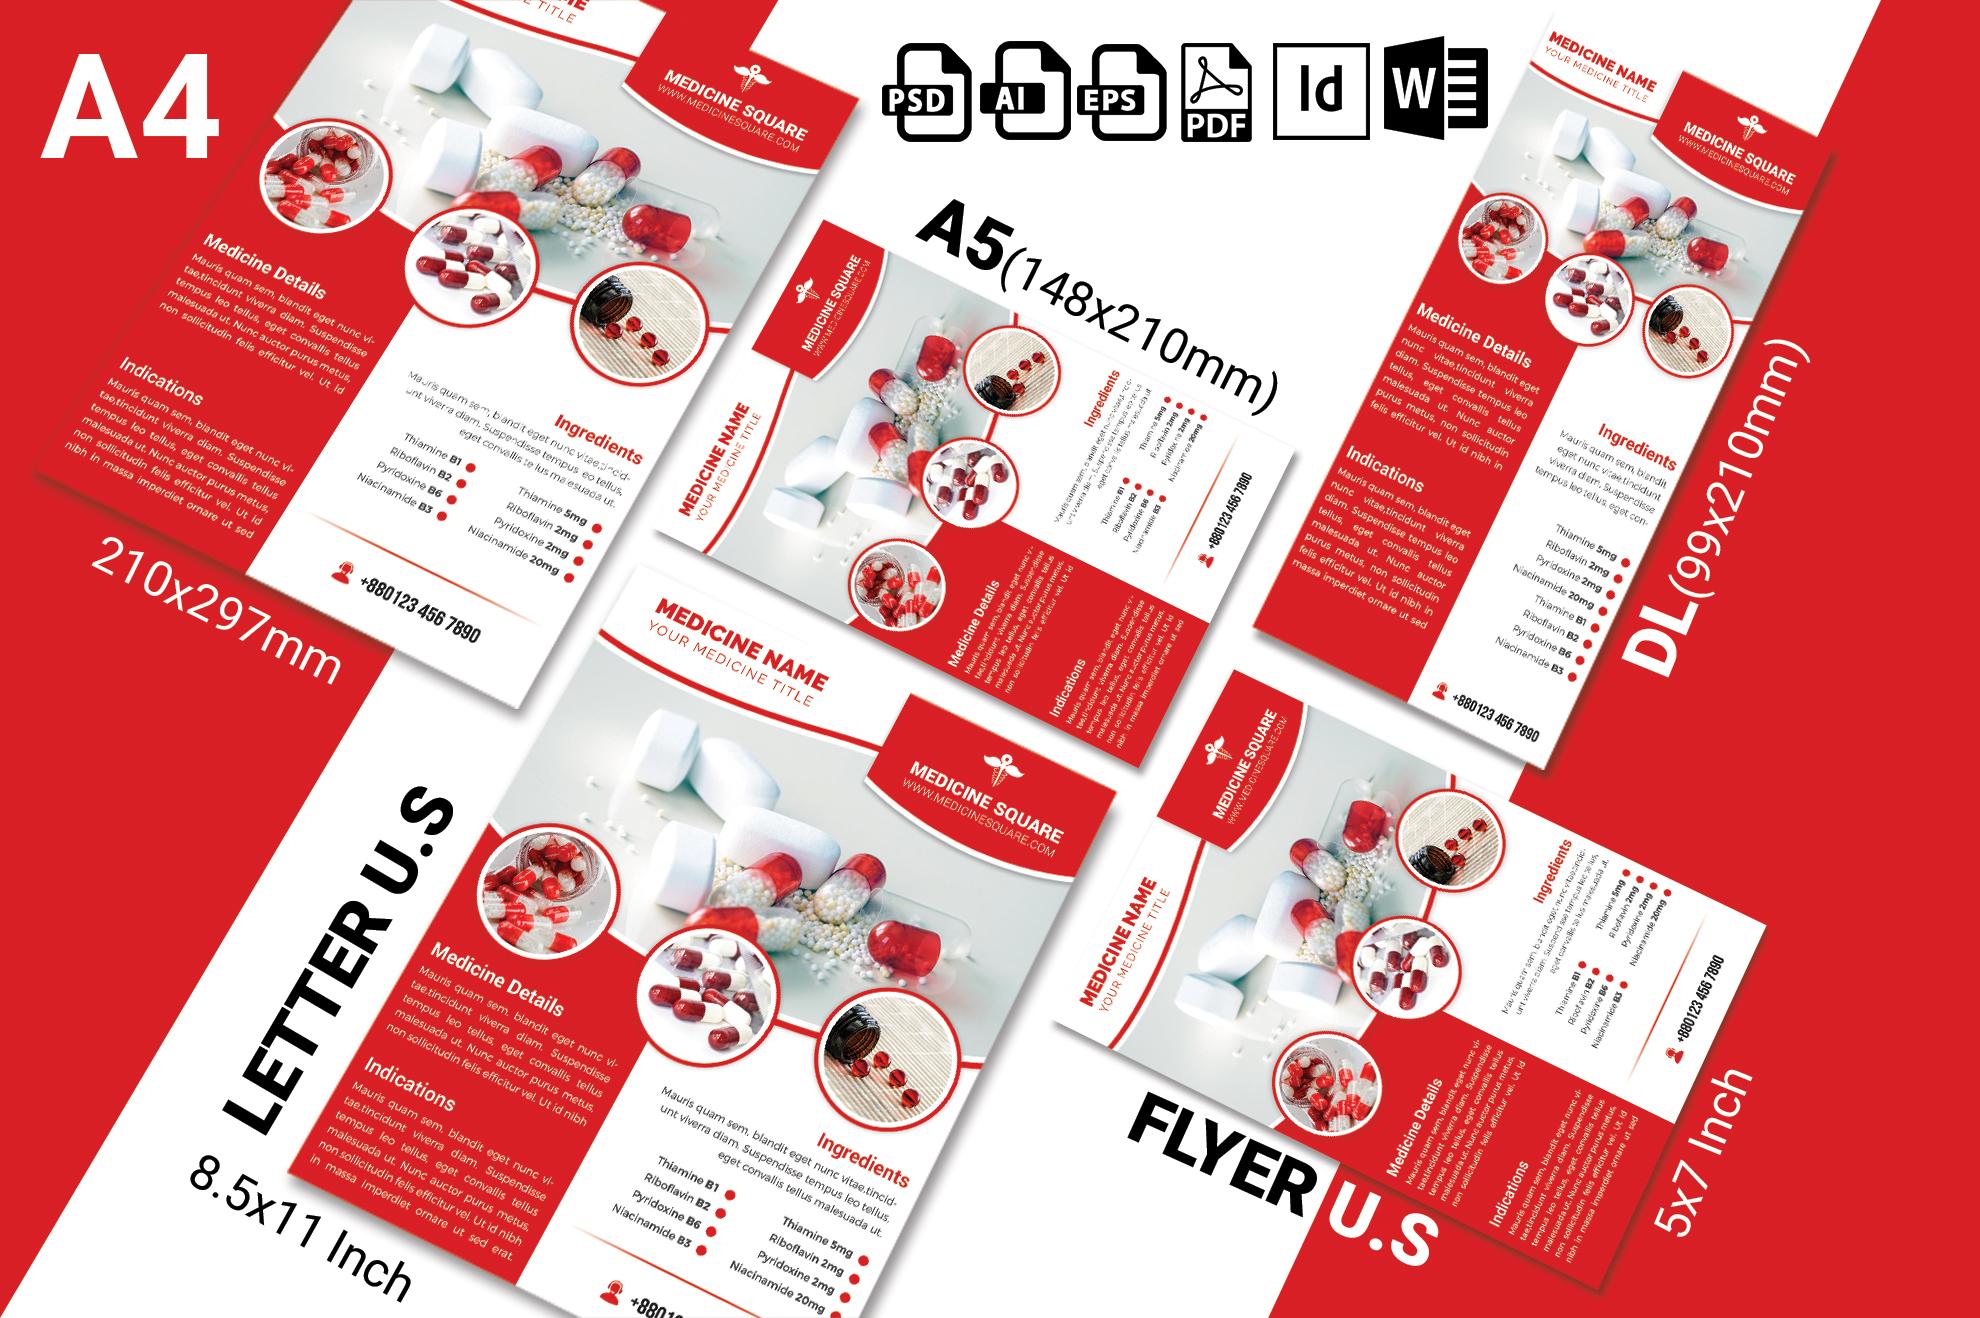 Medicine Promotional Flyer Vol-03 example image 2